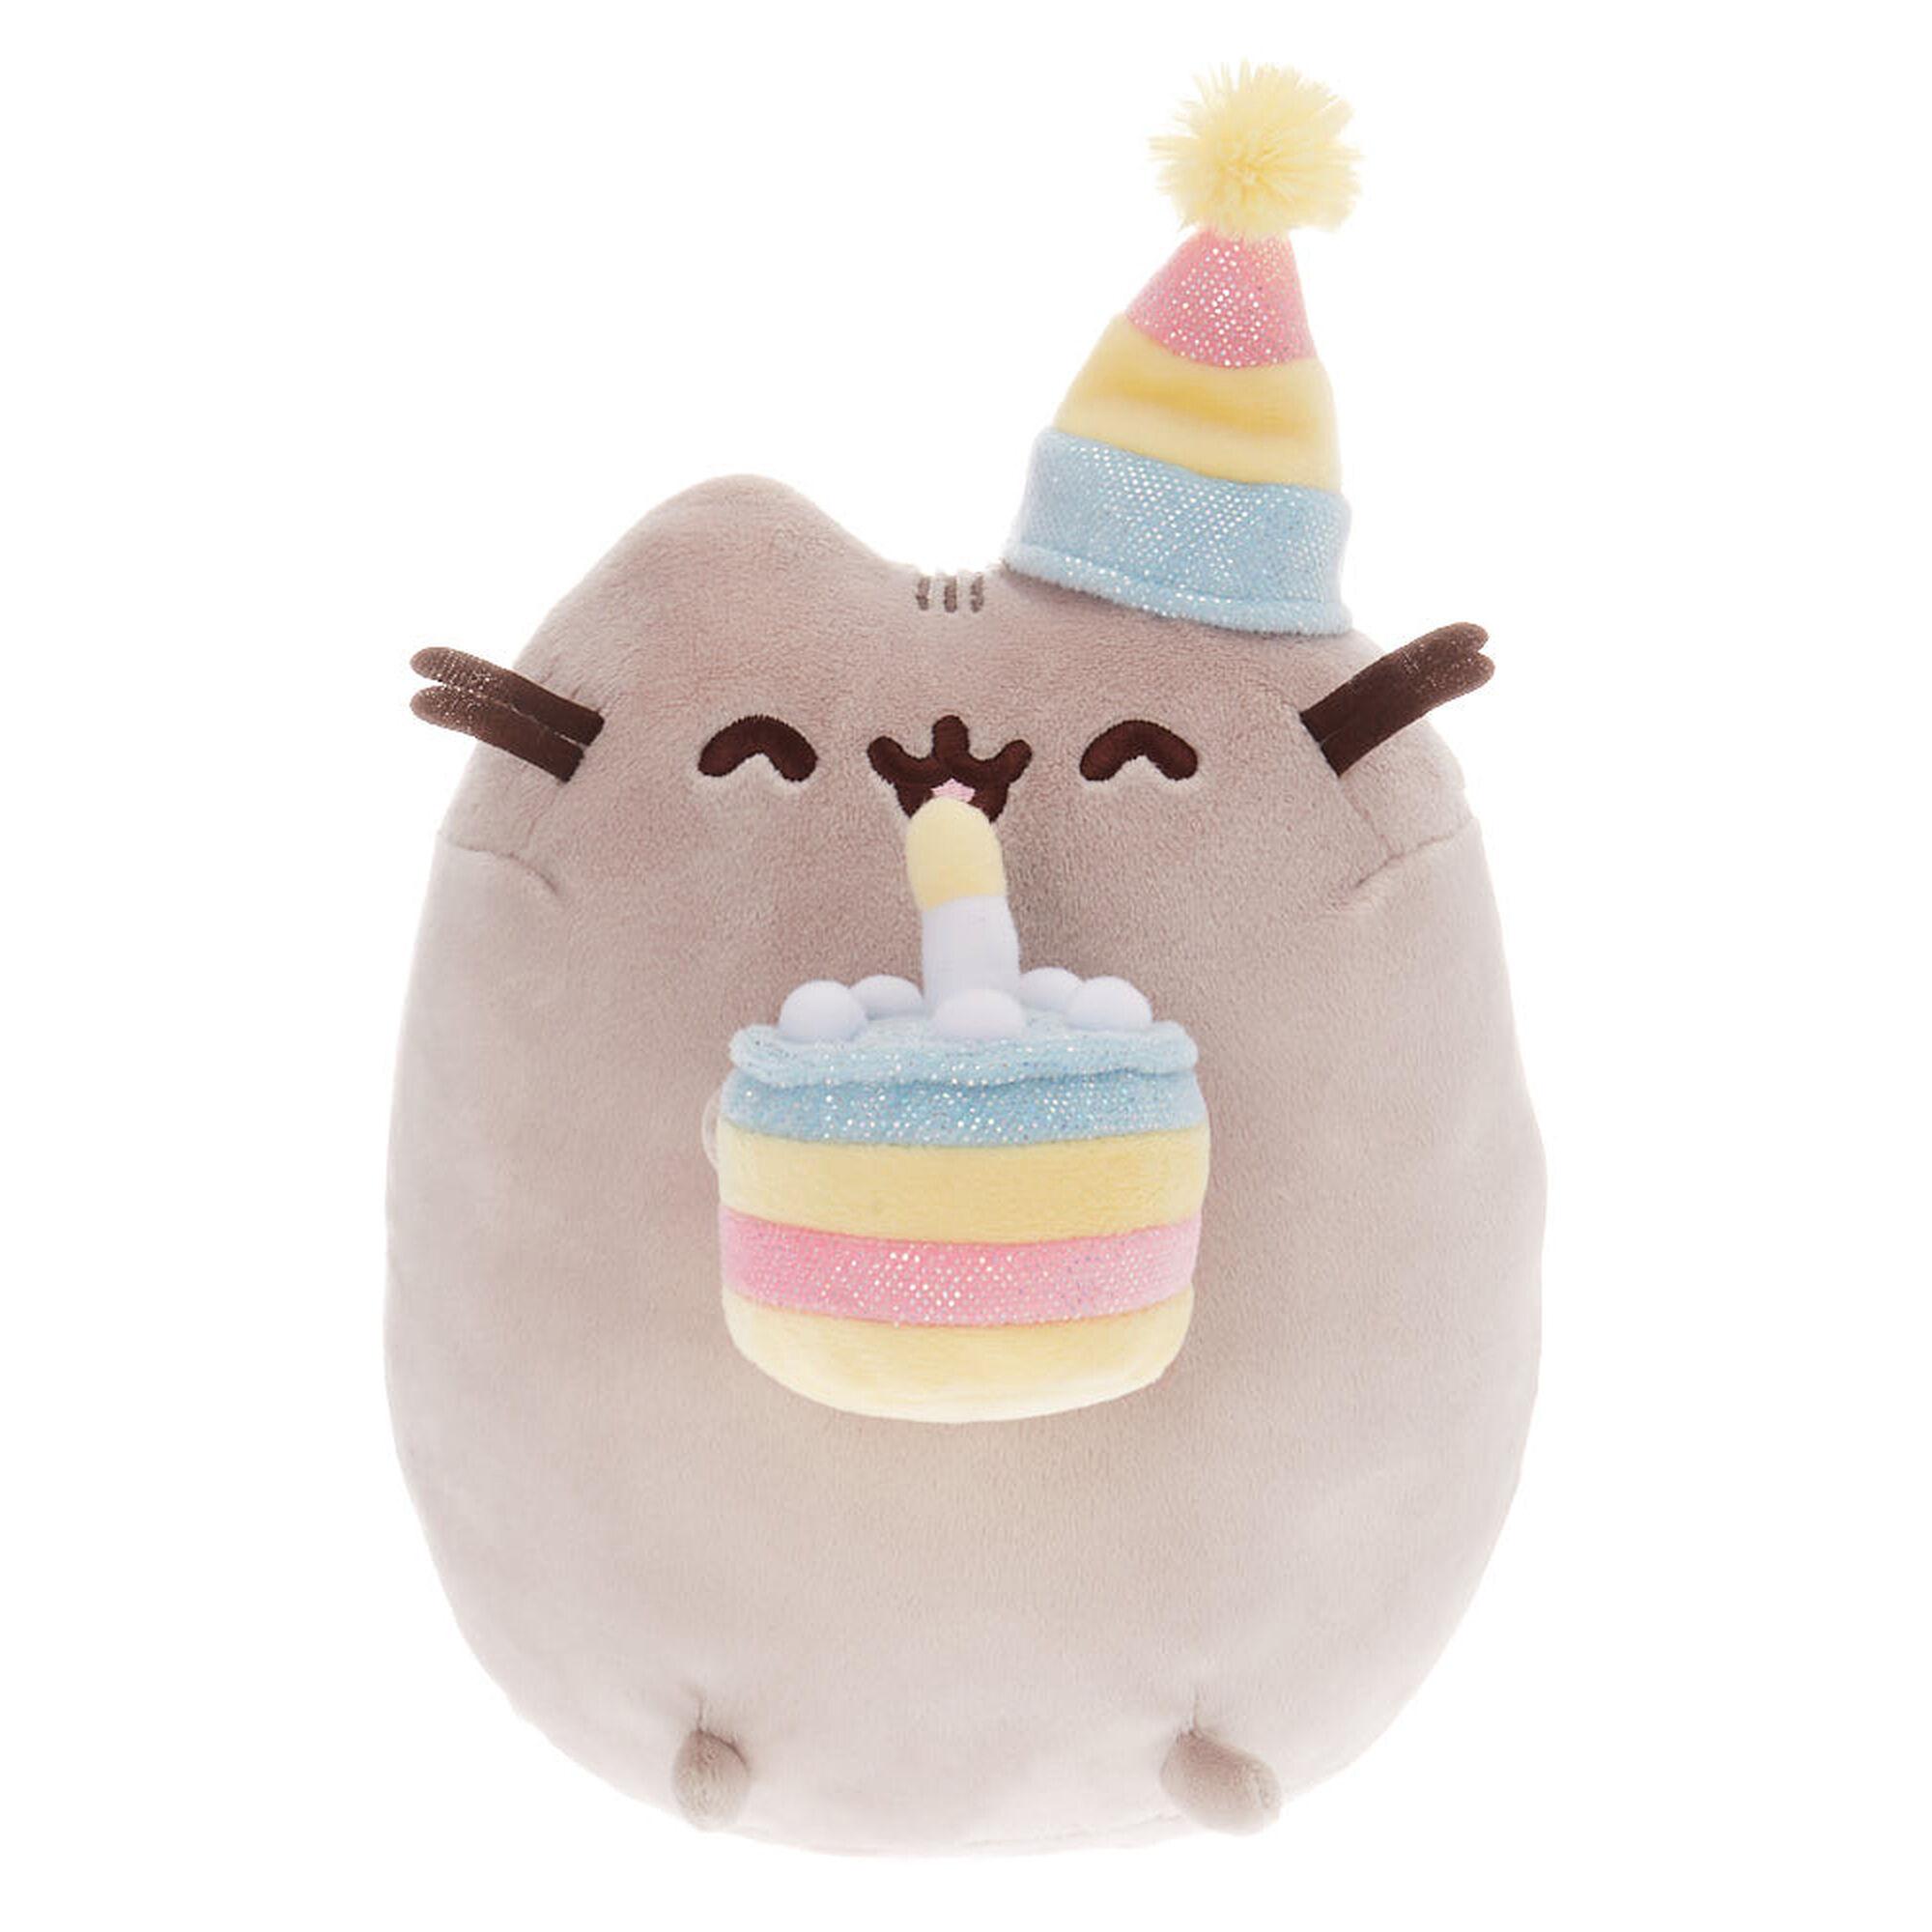 Tremendous Pusheen Large Birthday Cake Plush Toy Grey Claires Funny Birthday Cards Online Drosicarndamsfinfo